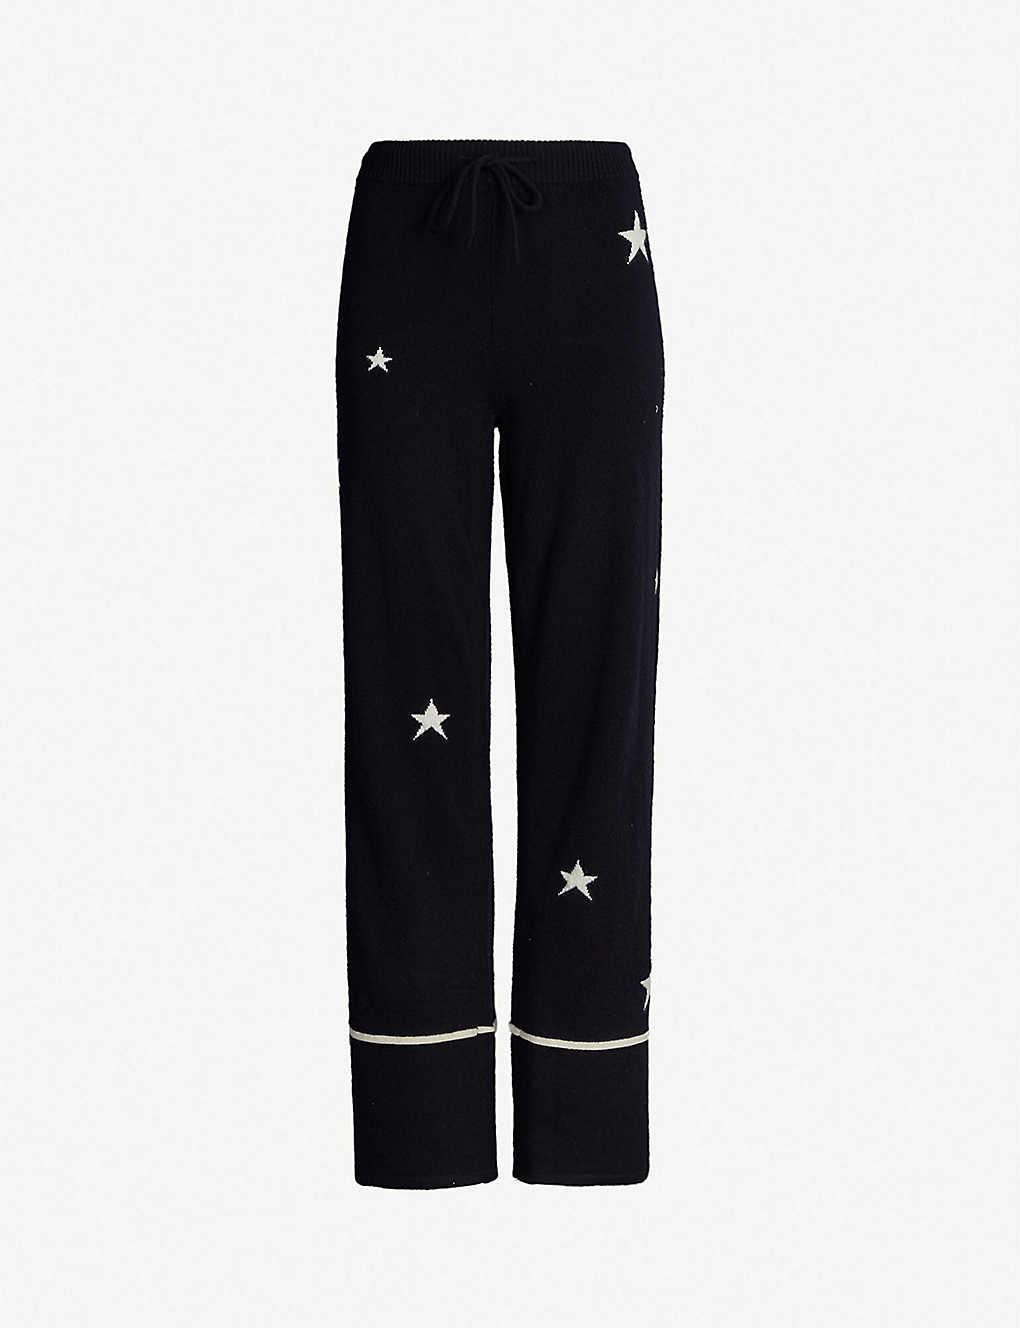 4de4fec64725 CHINTI AND PARKER - Star-intarsia cashmere pyjama bottoms ...